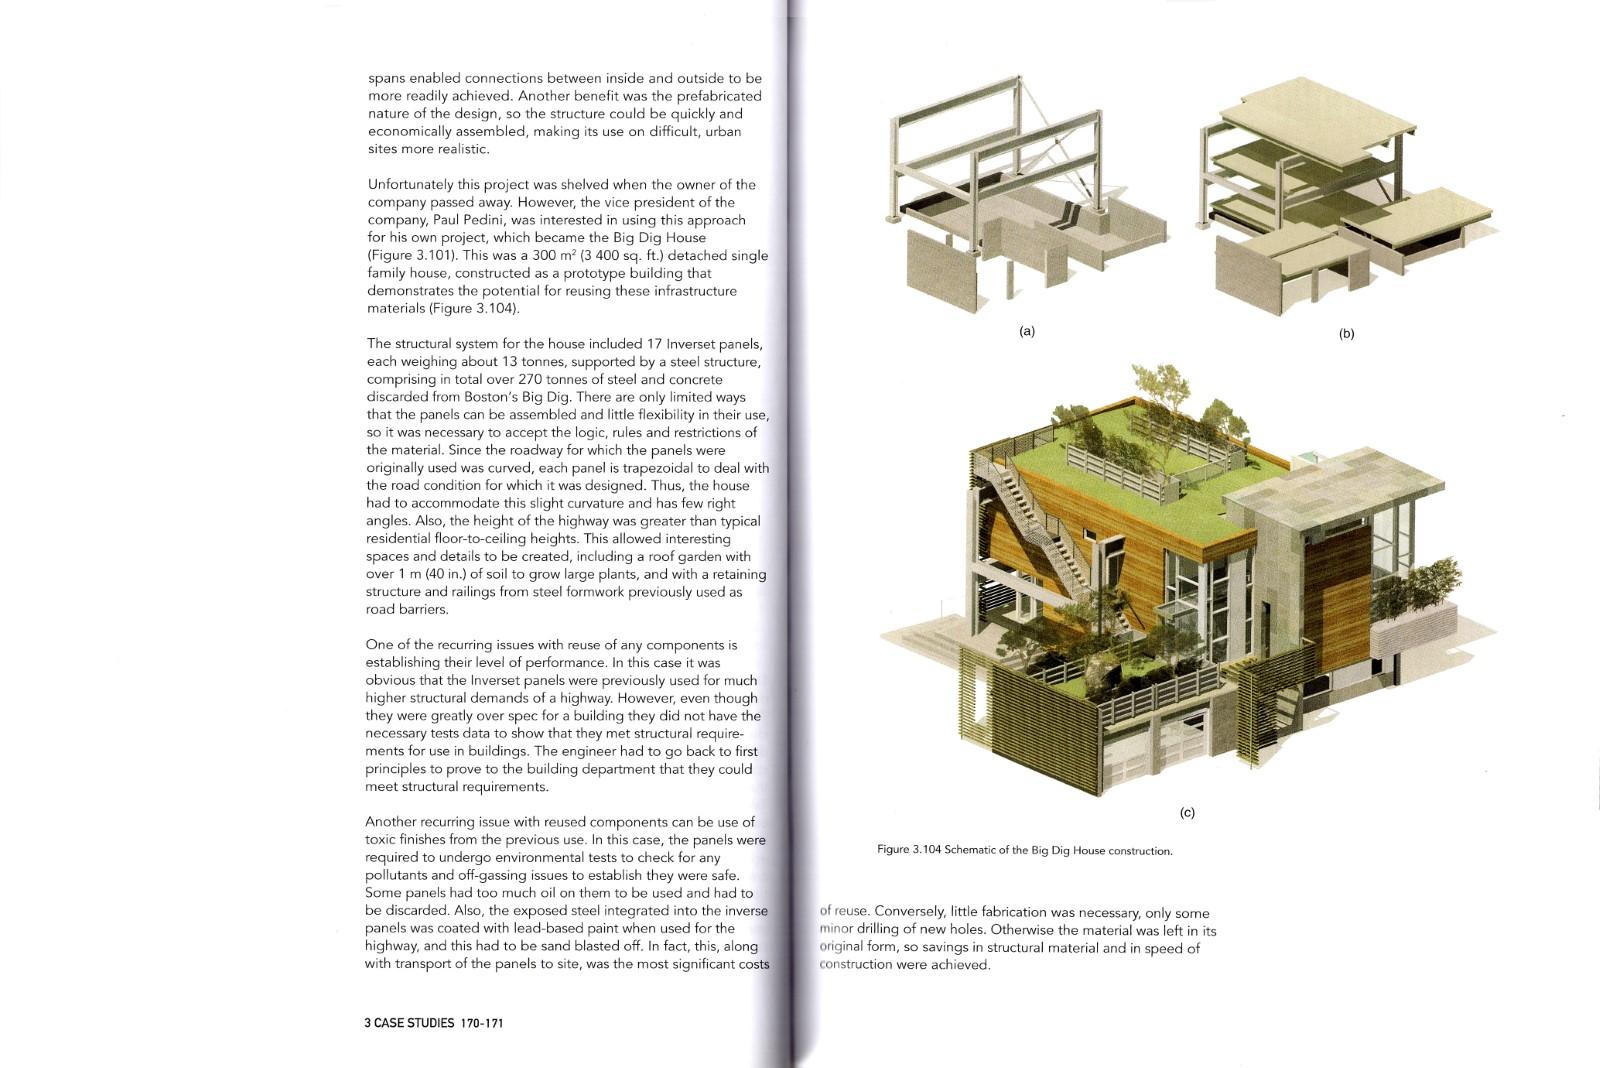 Resource Salvation - Big Dig House